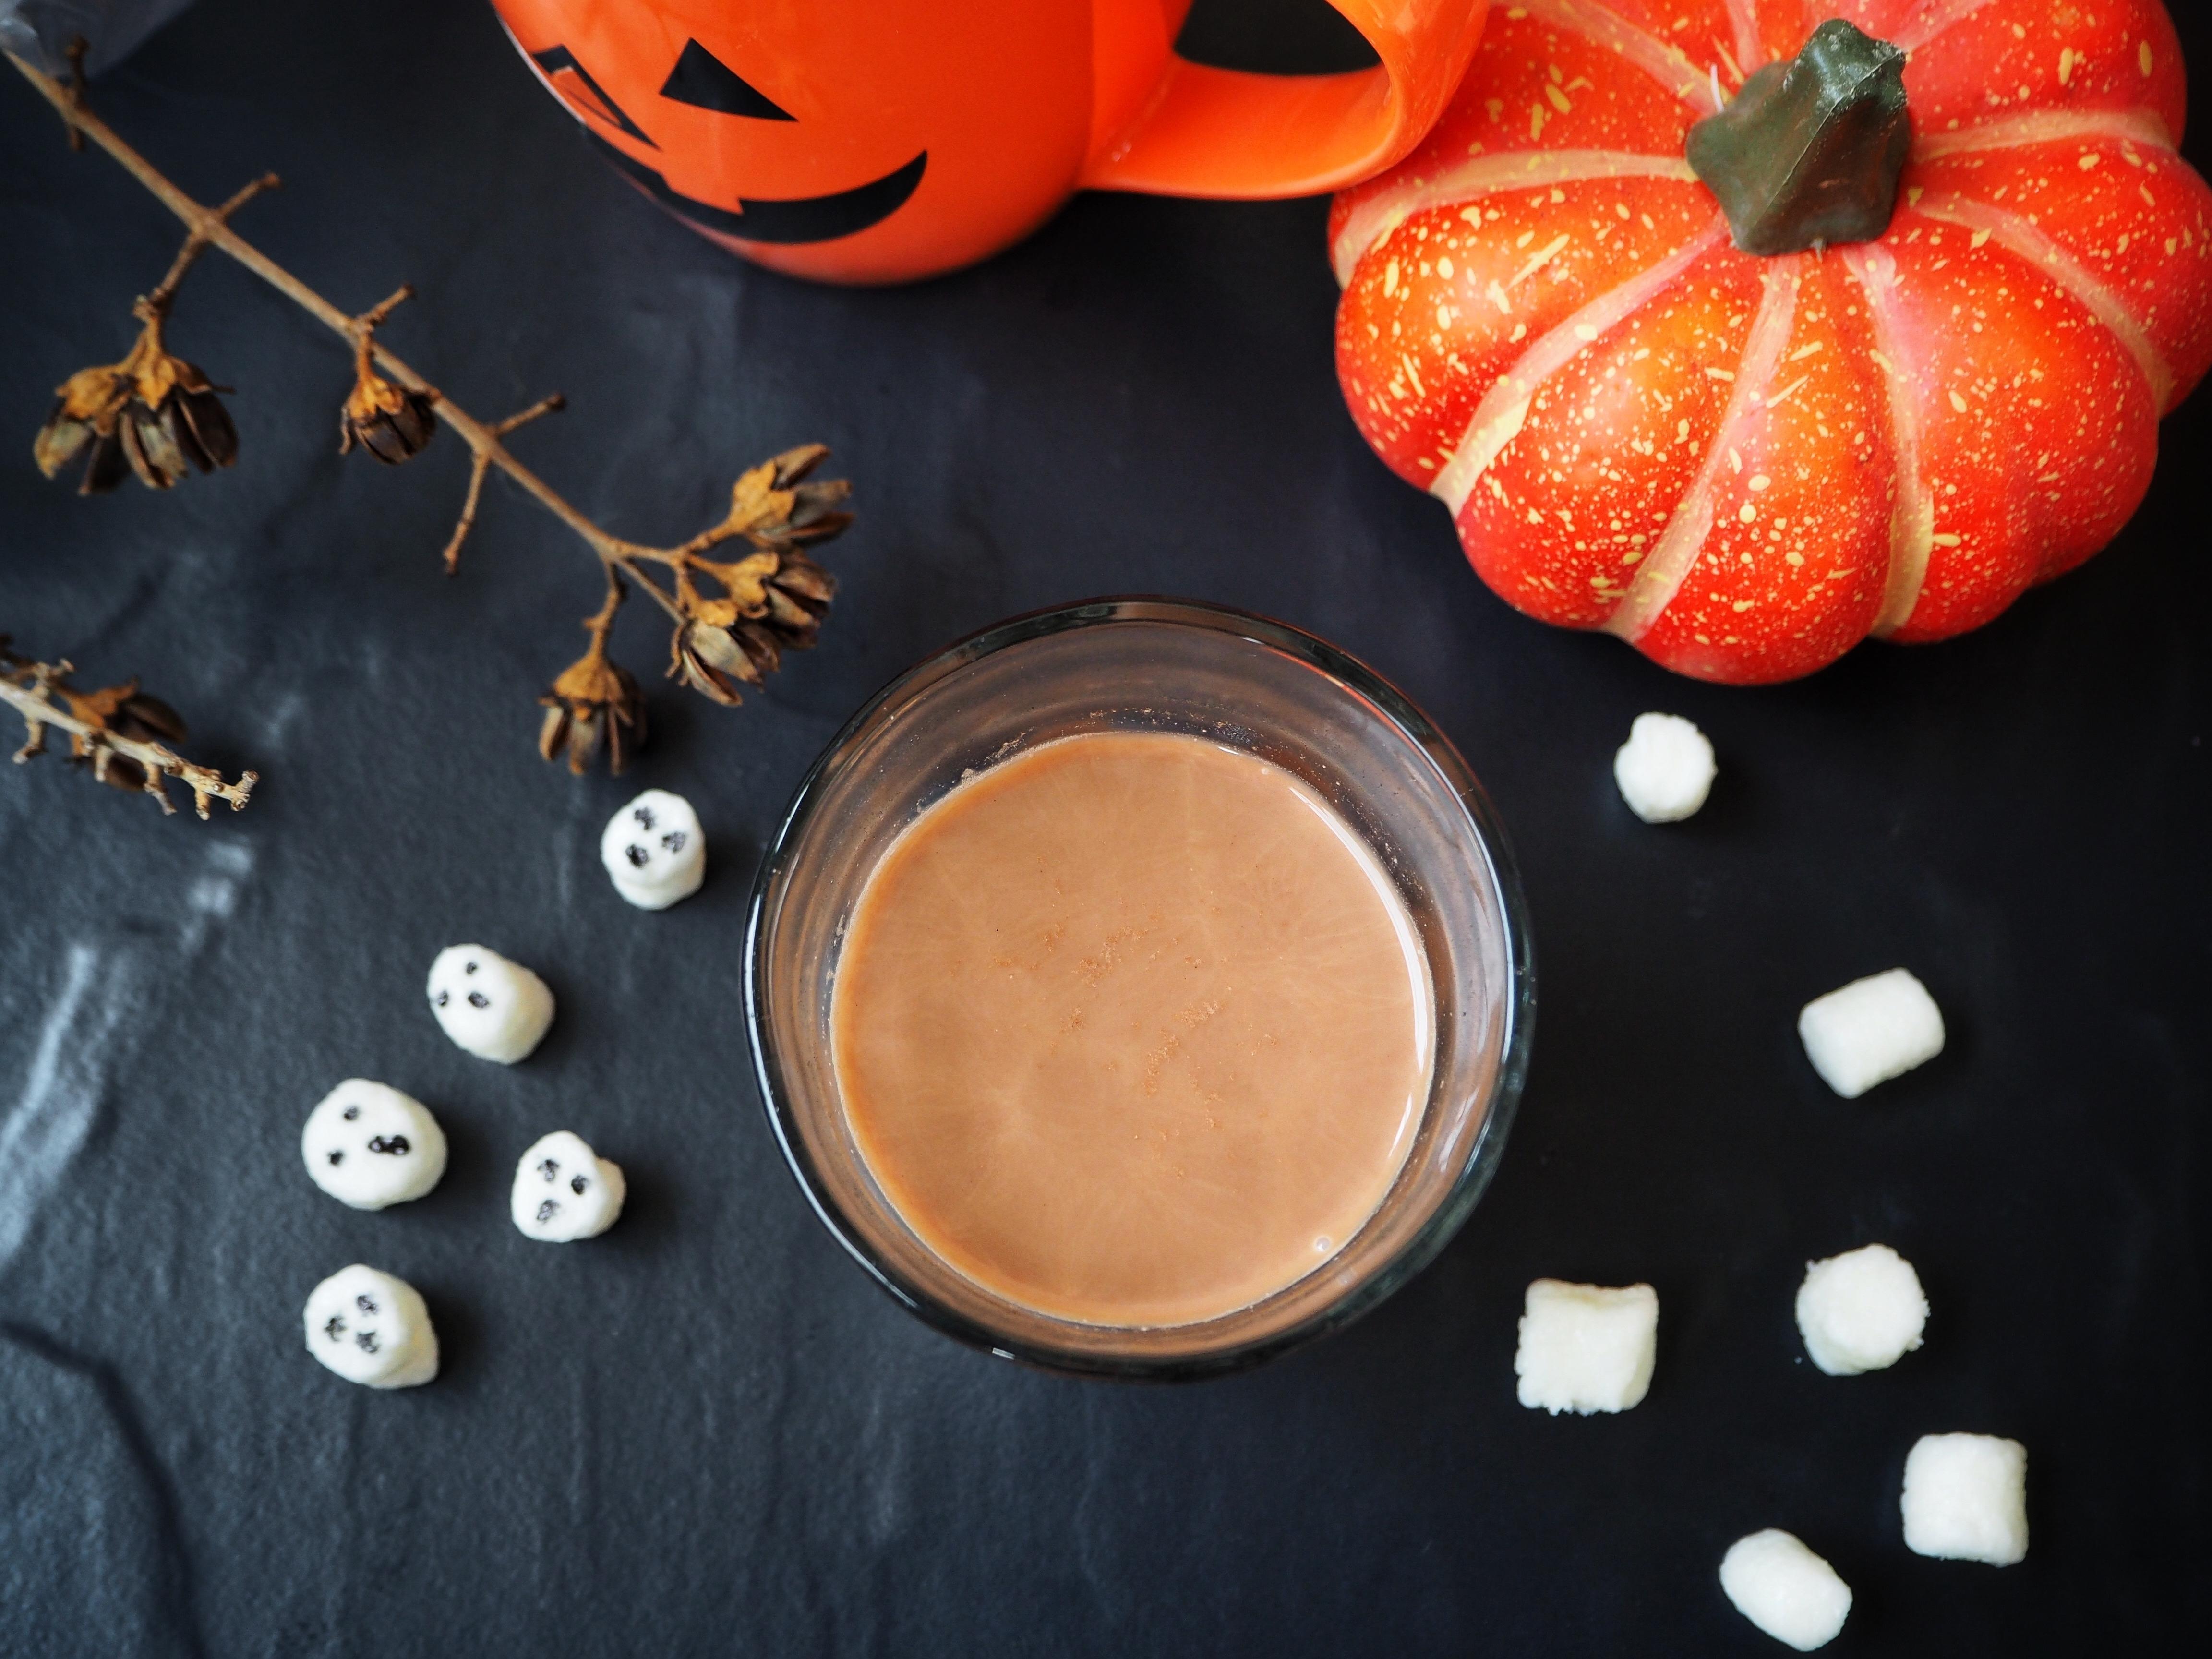 Hot Chocolate Top 8 Reasons To Love Halloween Season